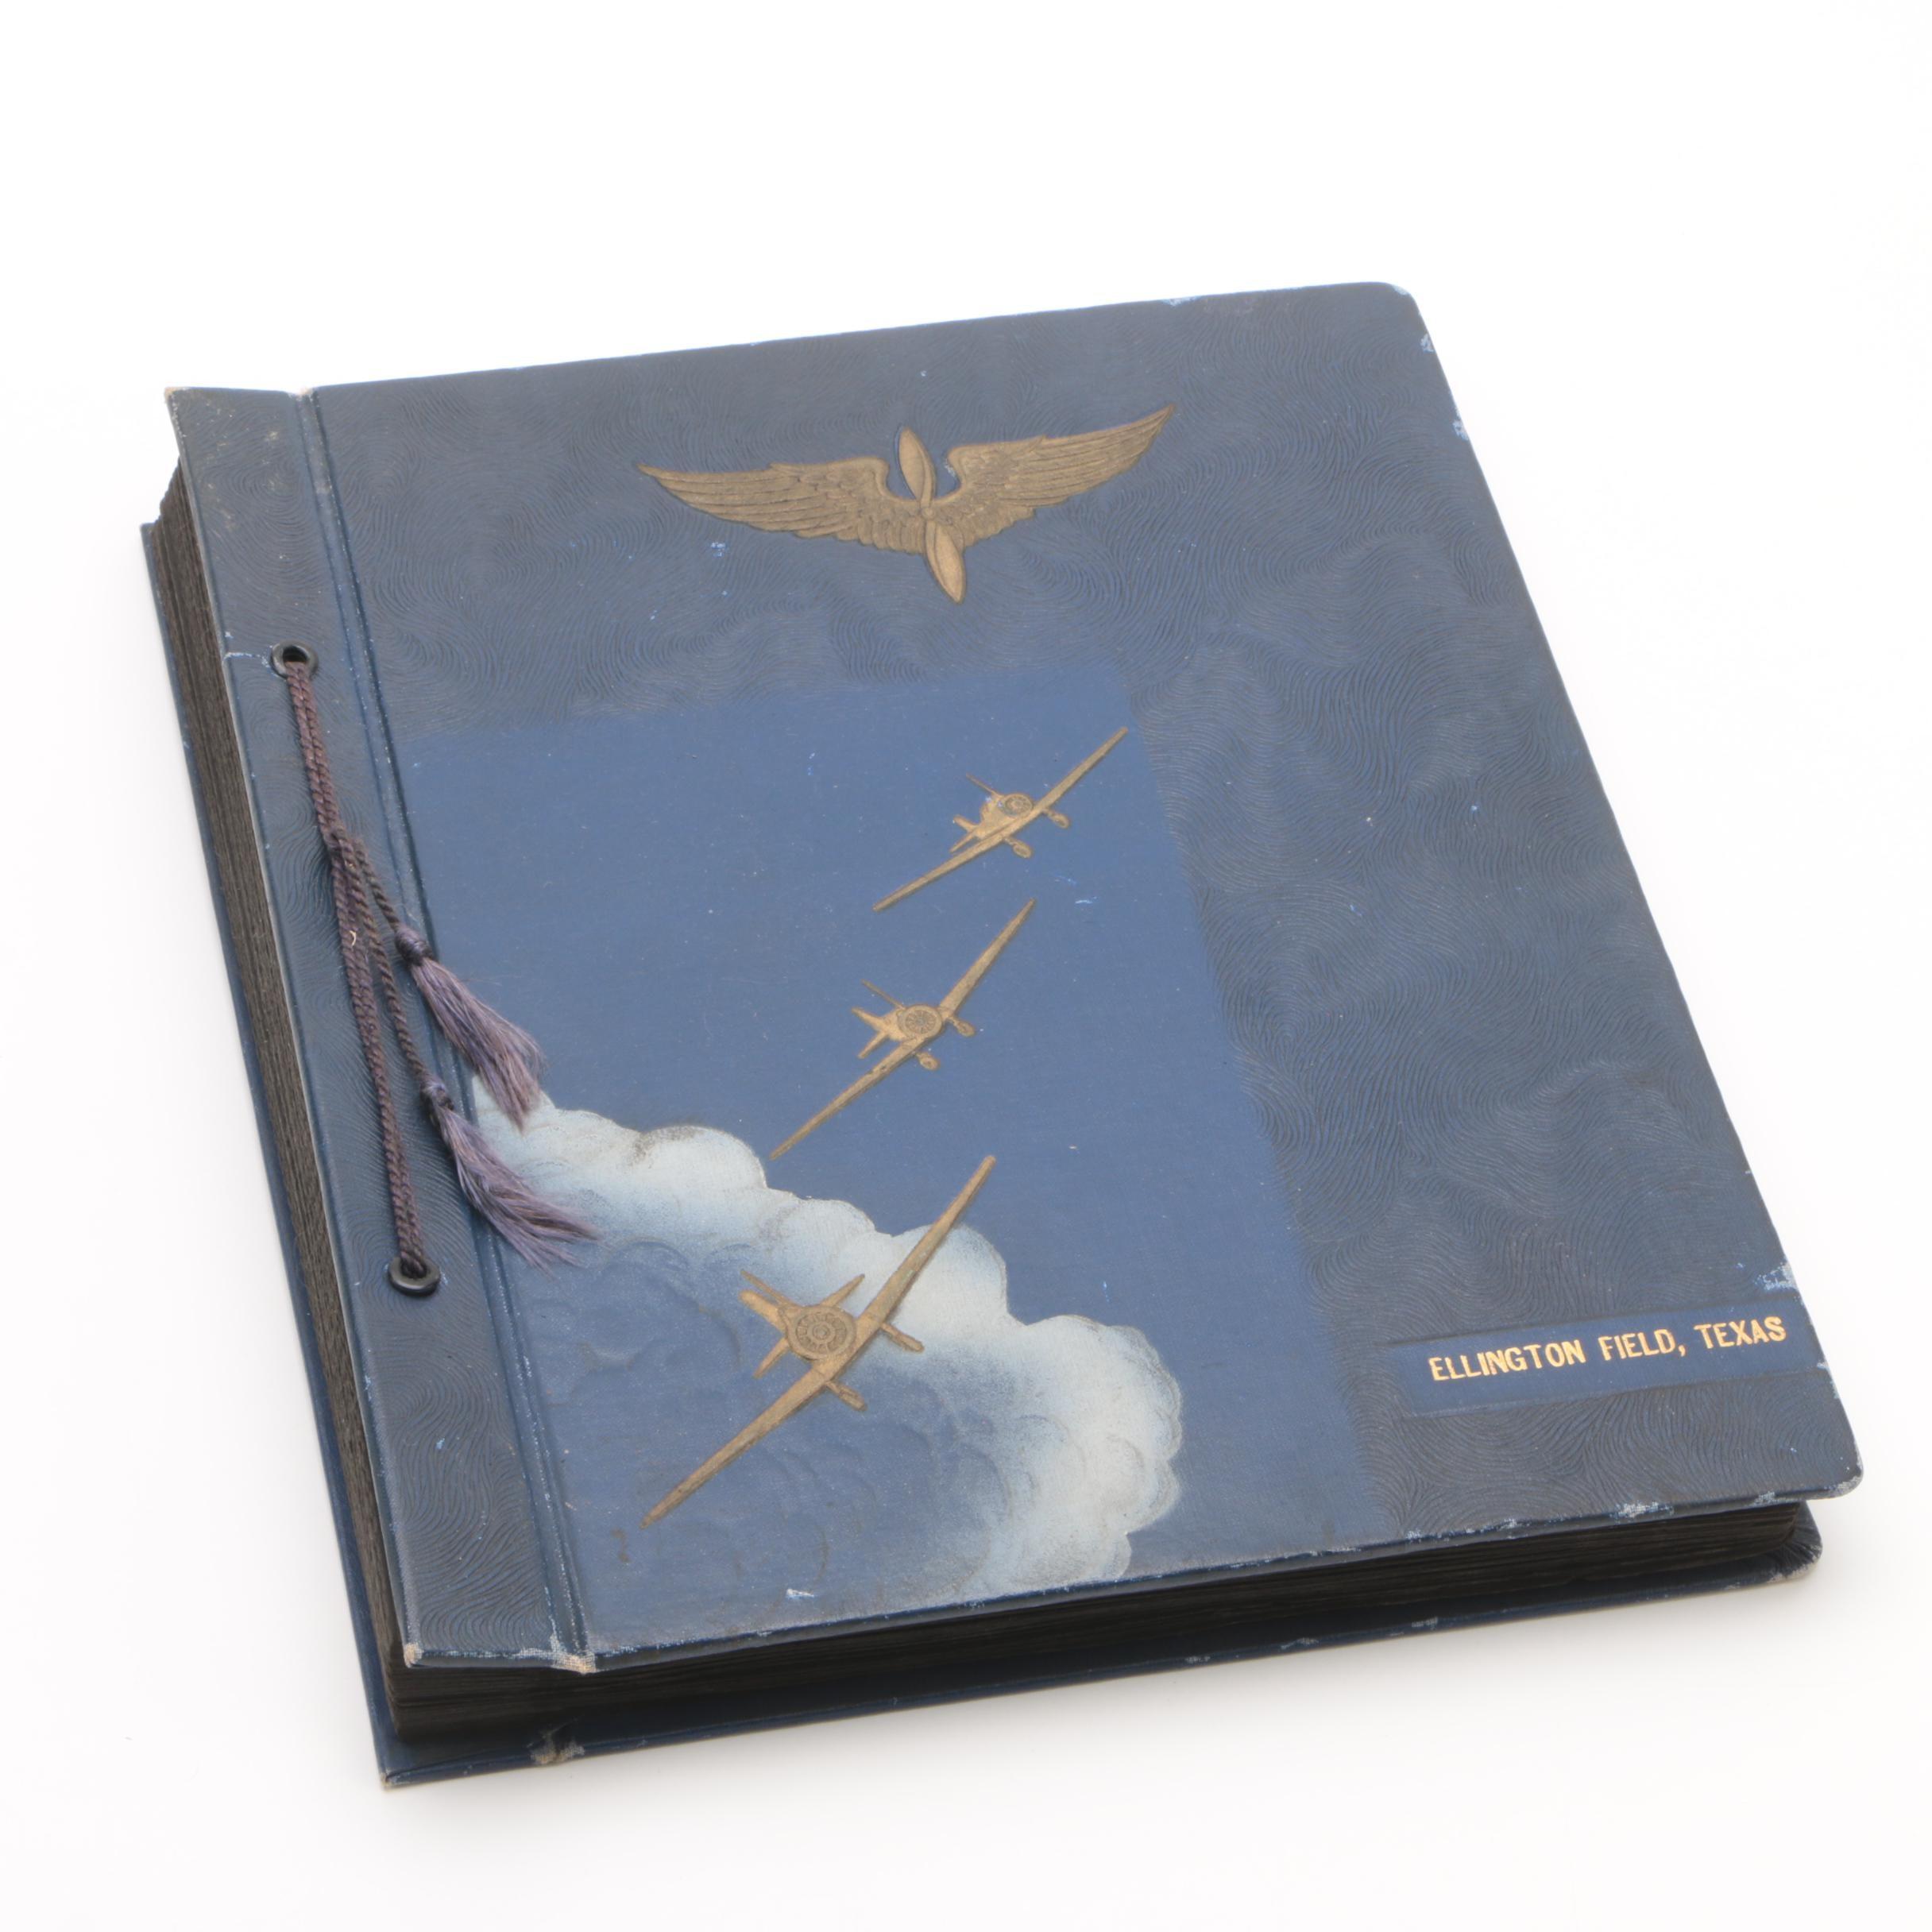 Air Force Scrapbook Ellington Field, Texas